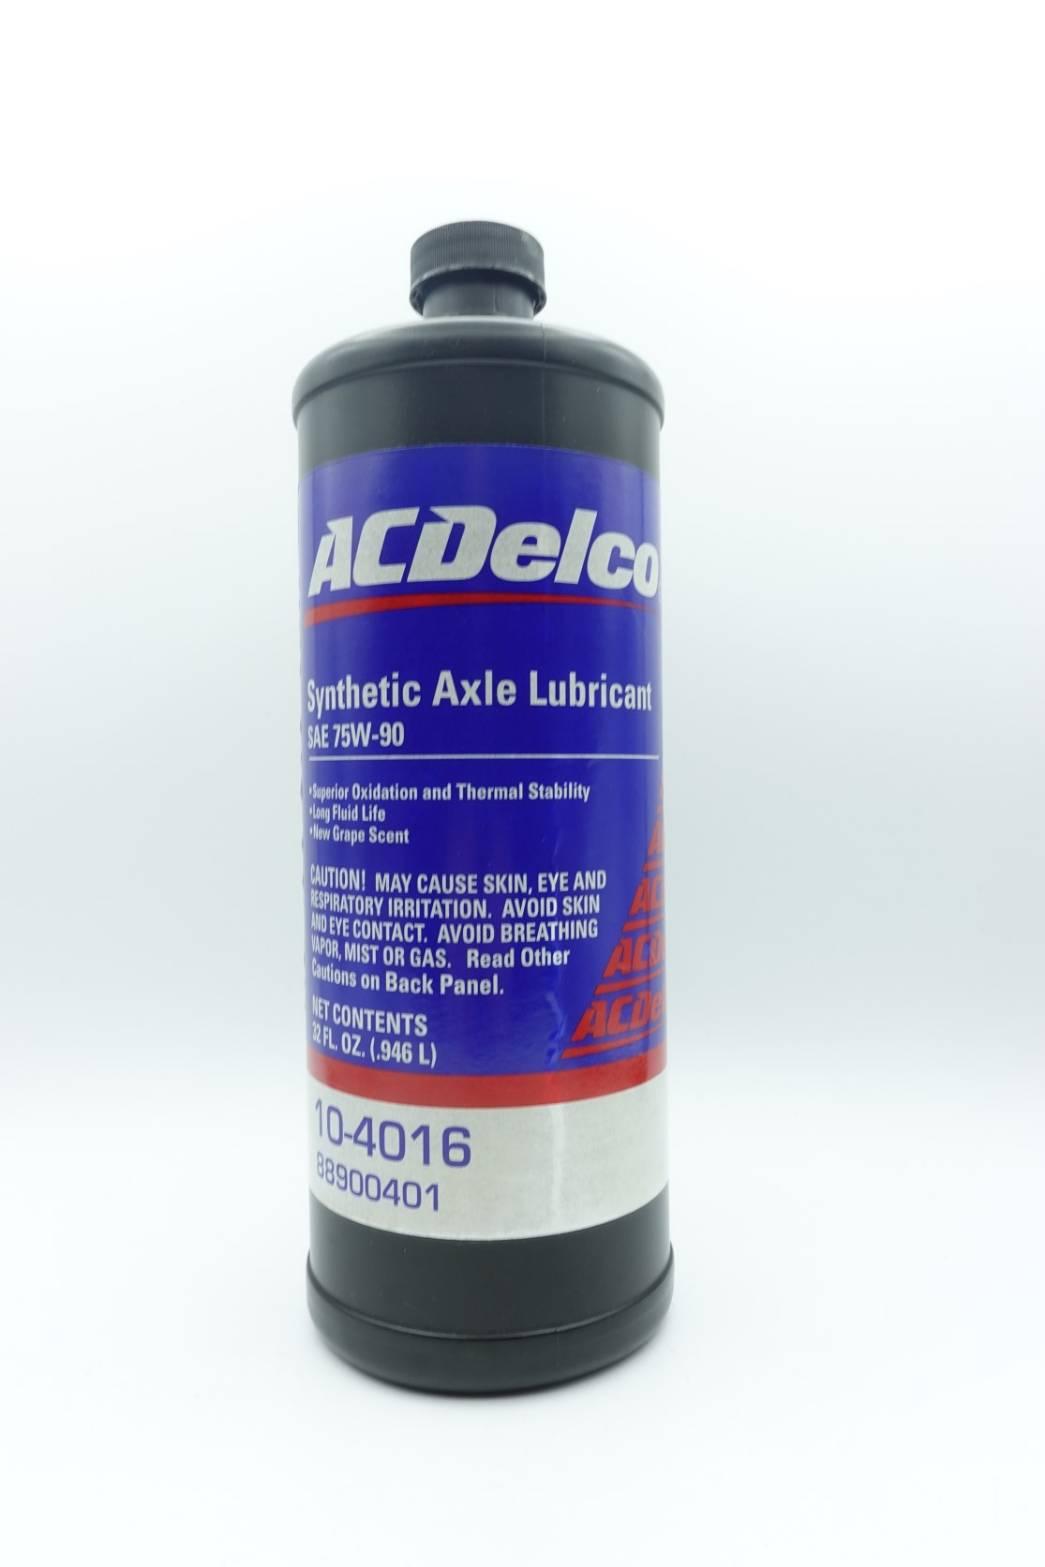 ACDelco น้ำมันเกียร์ 75W-90 ขนาด 1 ลิตร